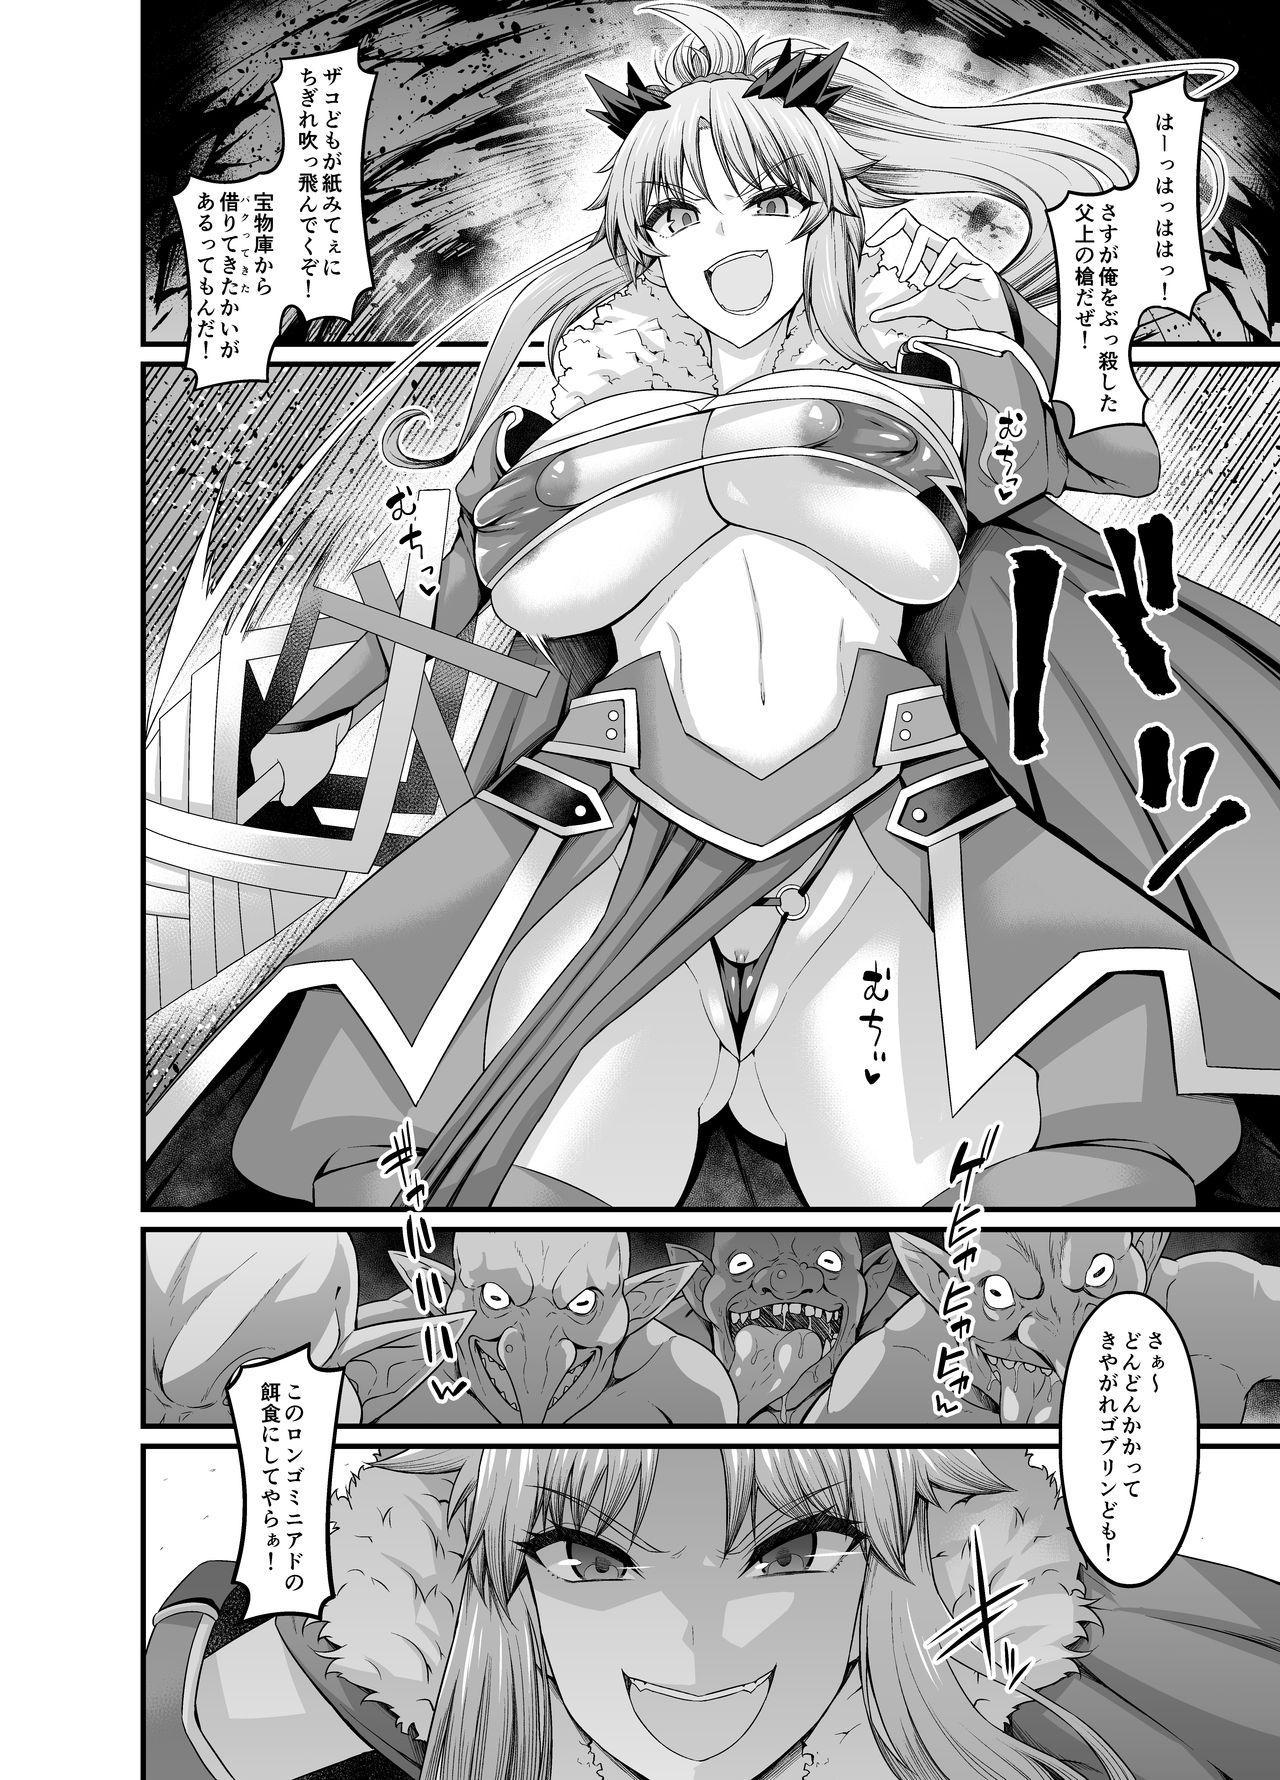 Bakunyū Ransāmōdoreddo vs Goburin 0